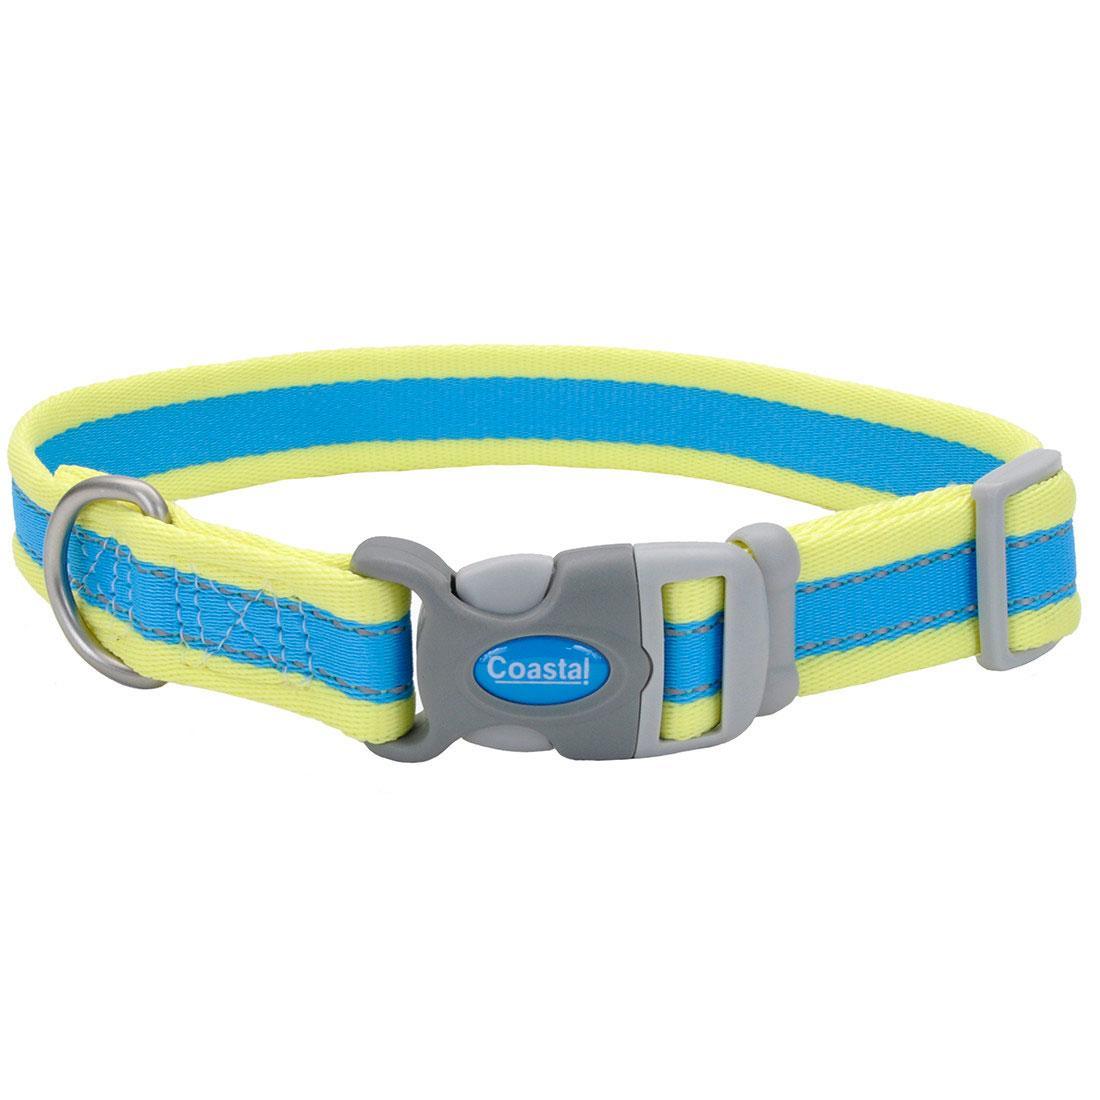 Coastal Pro Reflective Adjustable Dog Collar, 1-in x 18-26-in